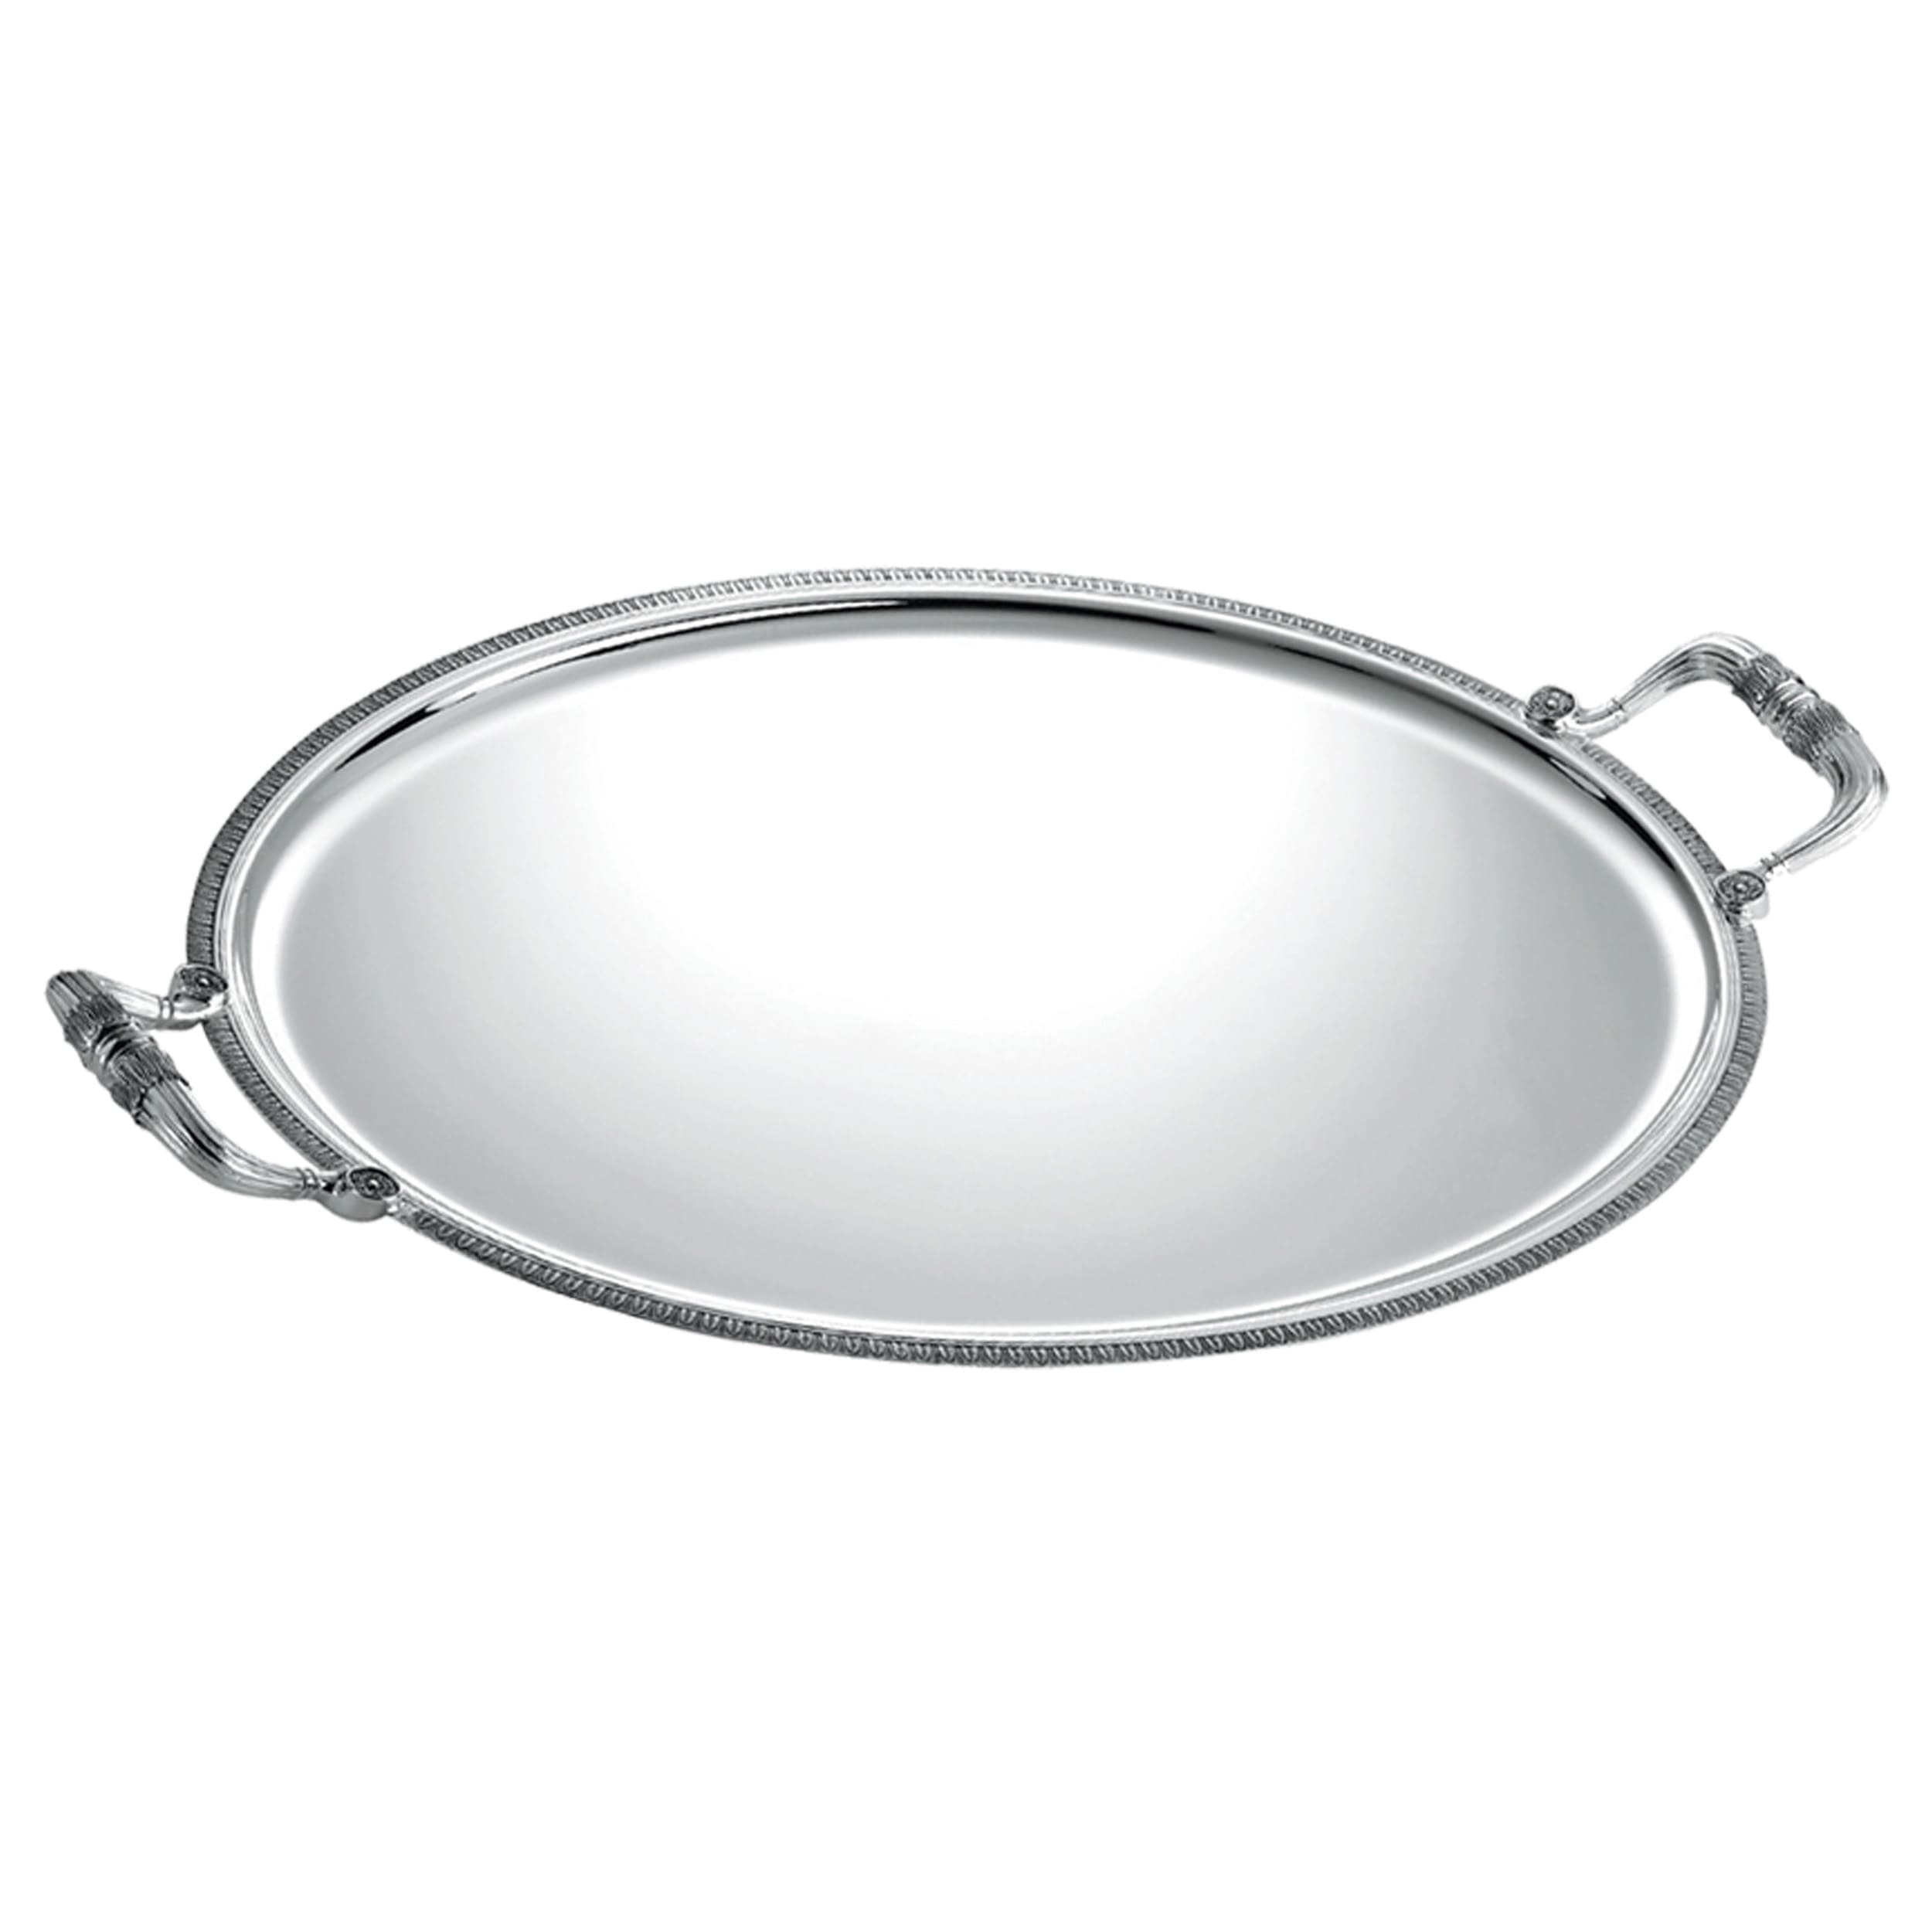 christofle silver plated malmaison oval tray